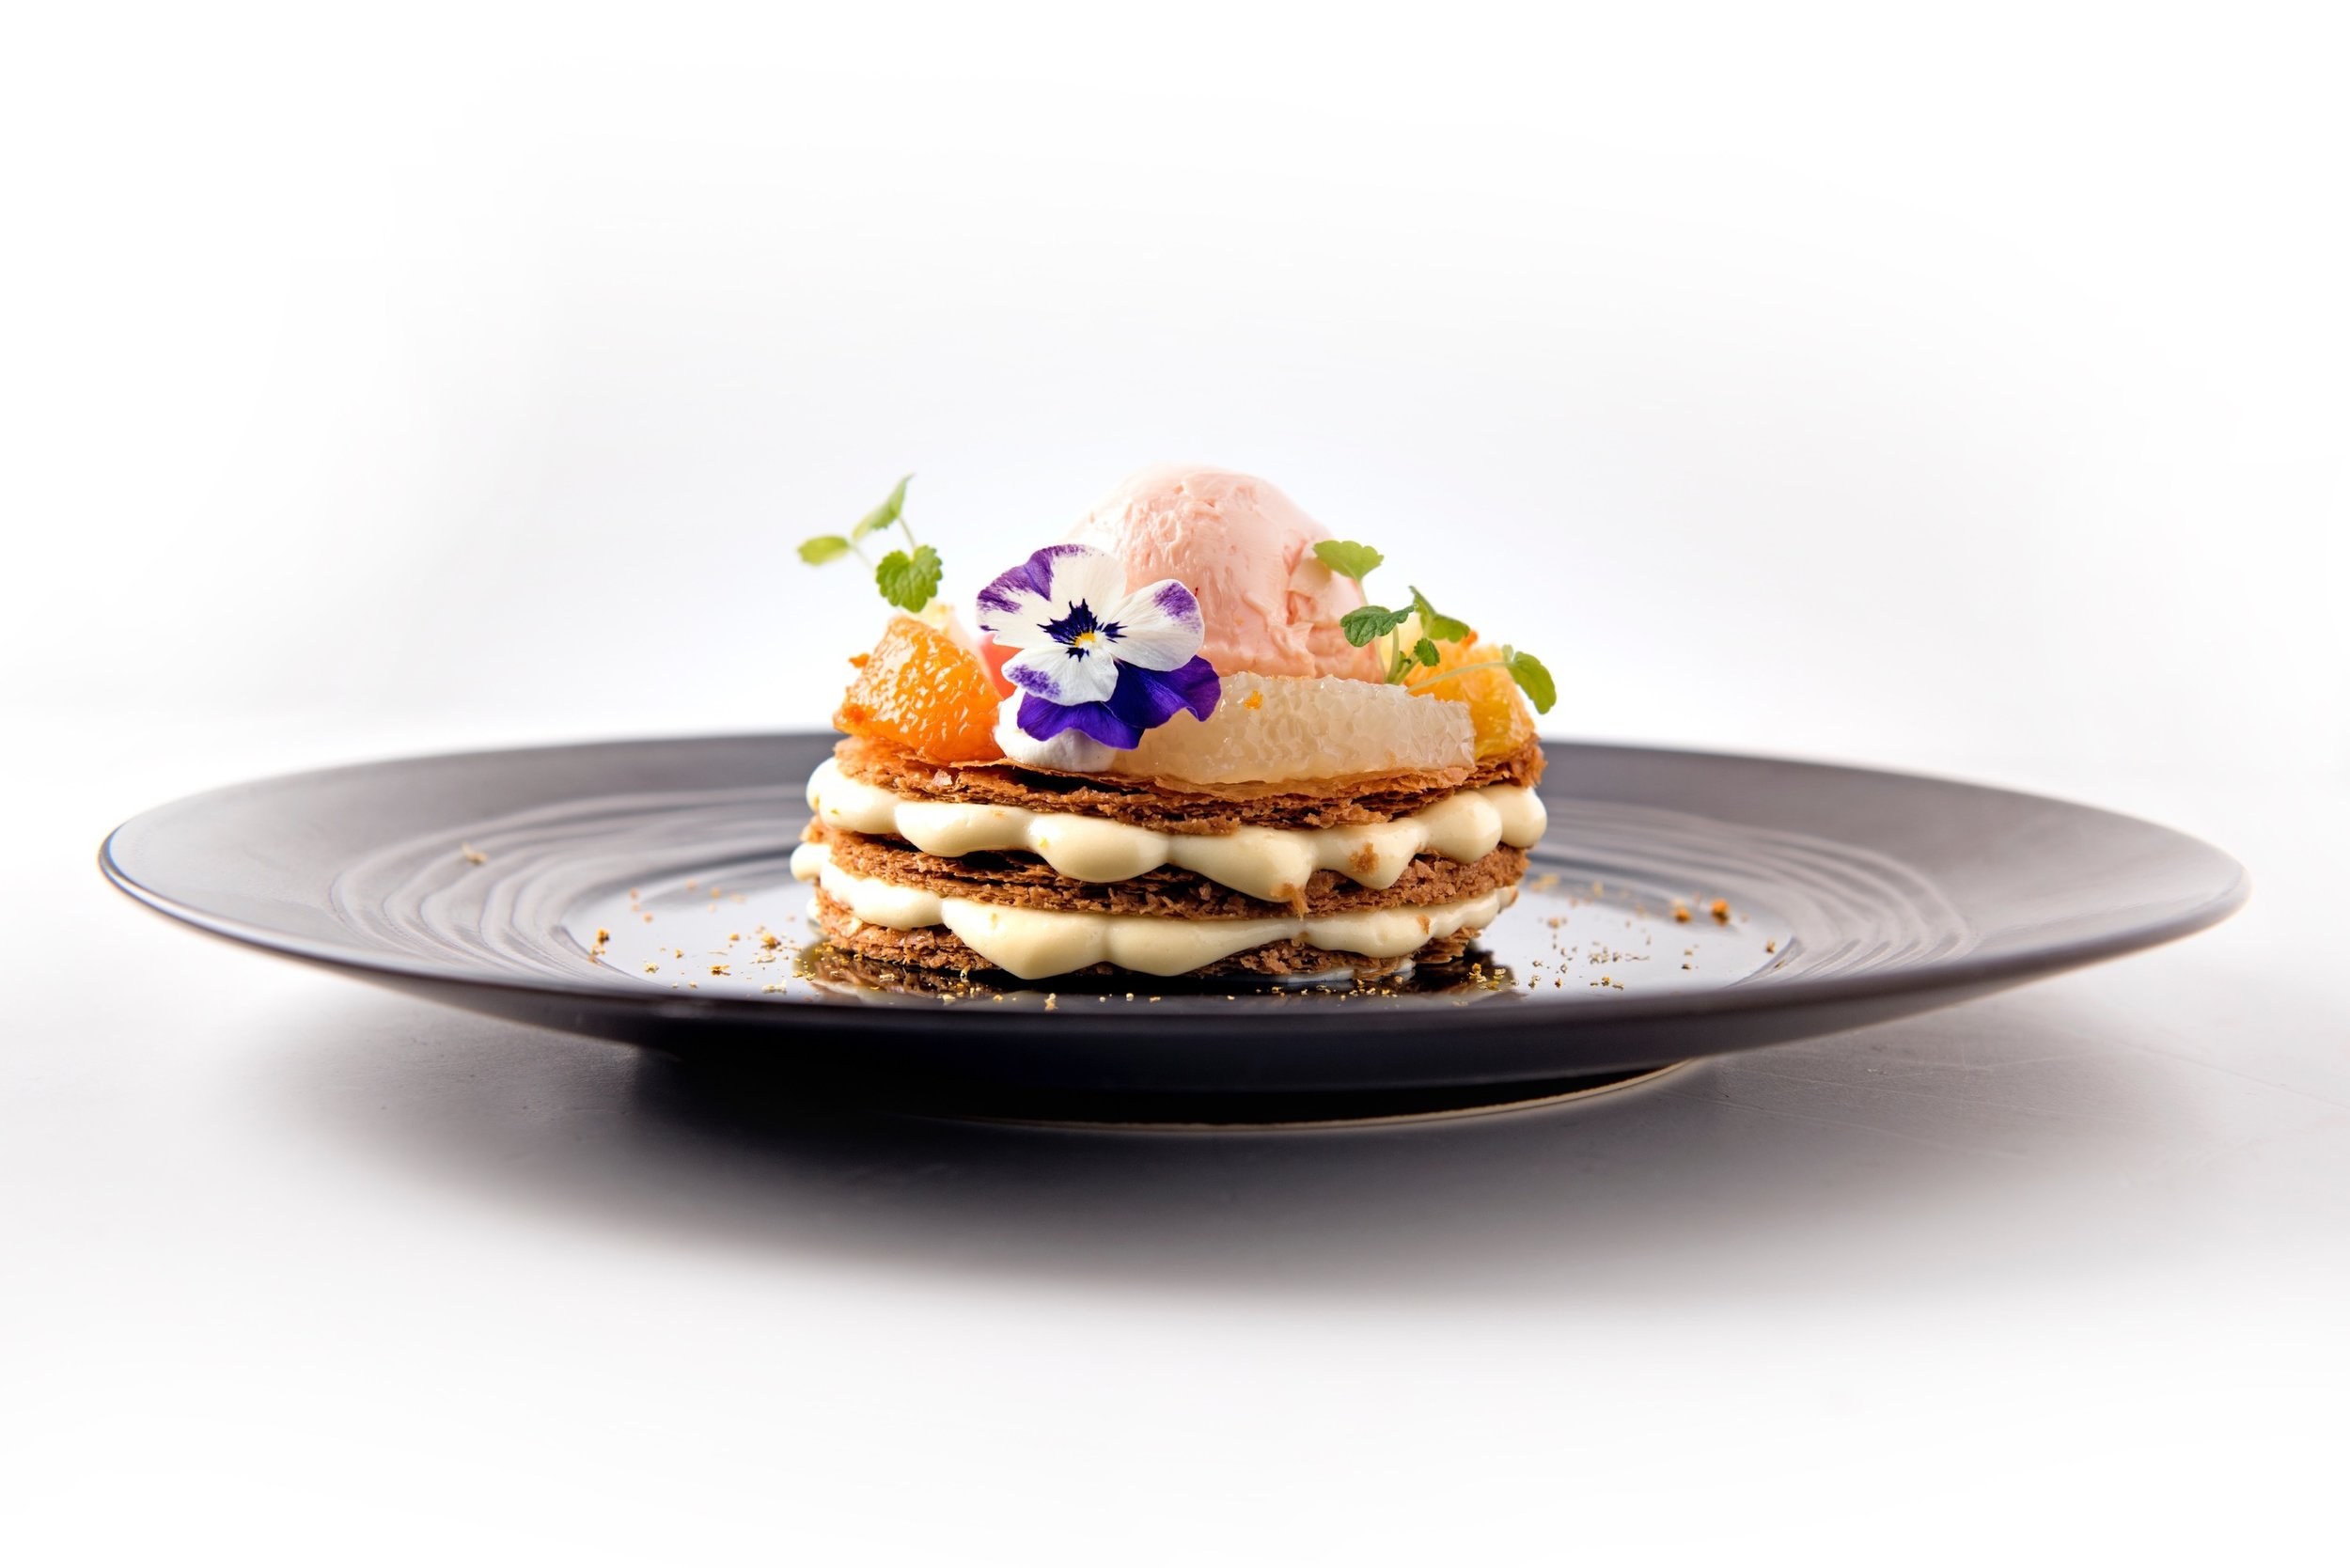 9 michelin restaurant the glorious antwerpen tablefever bart albrecht.jpg